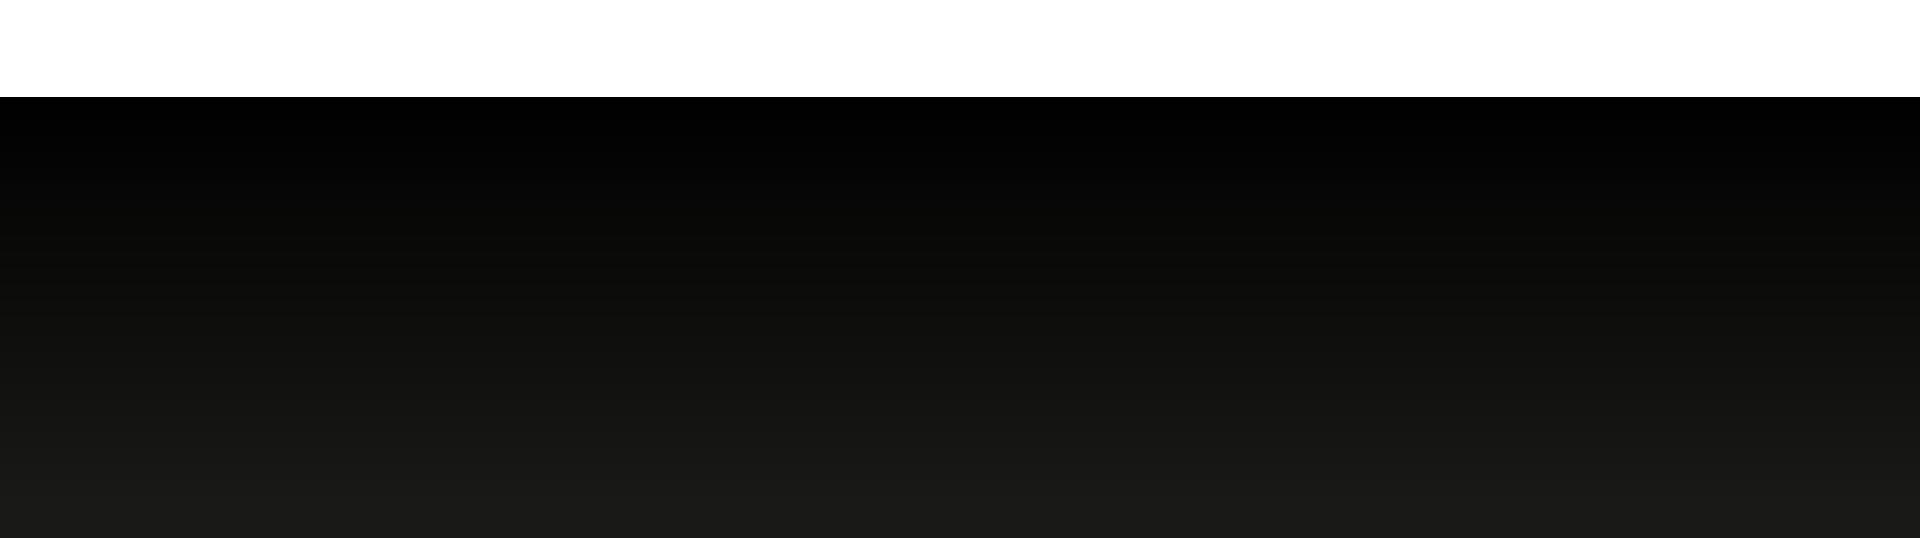 Cuisine traditionnelle Carcans, Cuisine traditionnelle Lacanau, Cuisine traditionnelle Montalivet, Fait maison Carcans, Fait maison Lacanau, Fait maison Montalivet, Hotel Carcans, Hotel Lacanau, Hotel Montalivet, Restaurant Carcans, Restaurant Lacanau, Restaurant Montalivet, Soirée étape Carcans, Soirée étape Lacanau, Soirée étape Montalivet